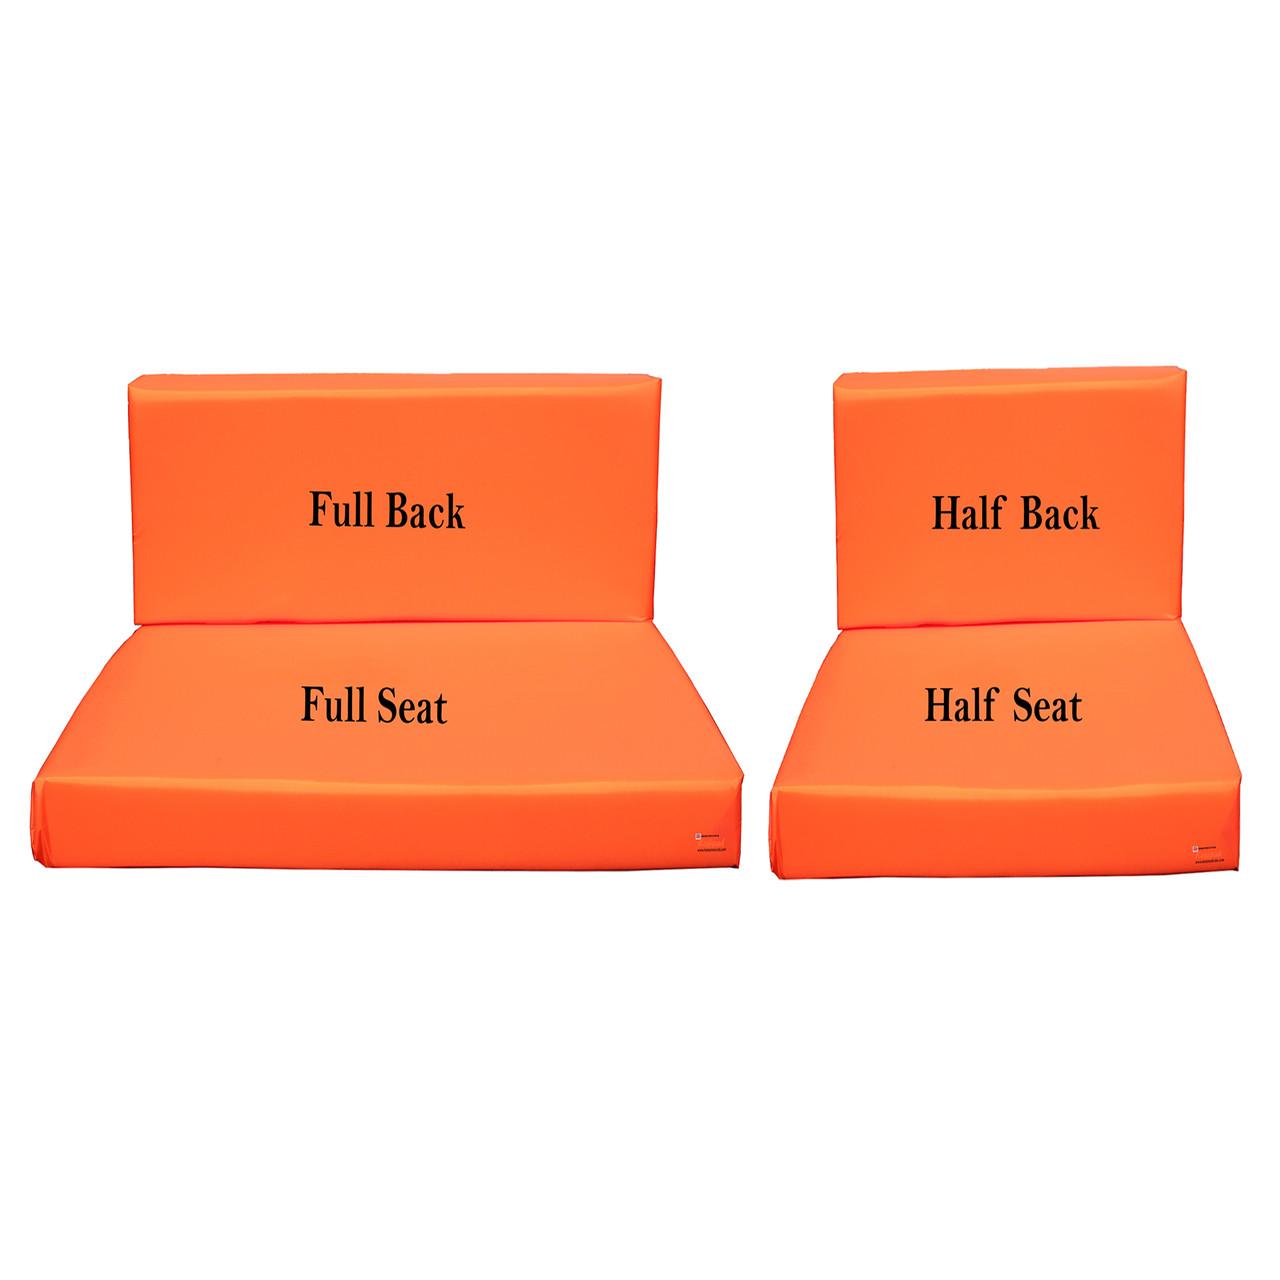 Kosipad Orange waterproof pallet  Cushions for Euro Pallets